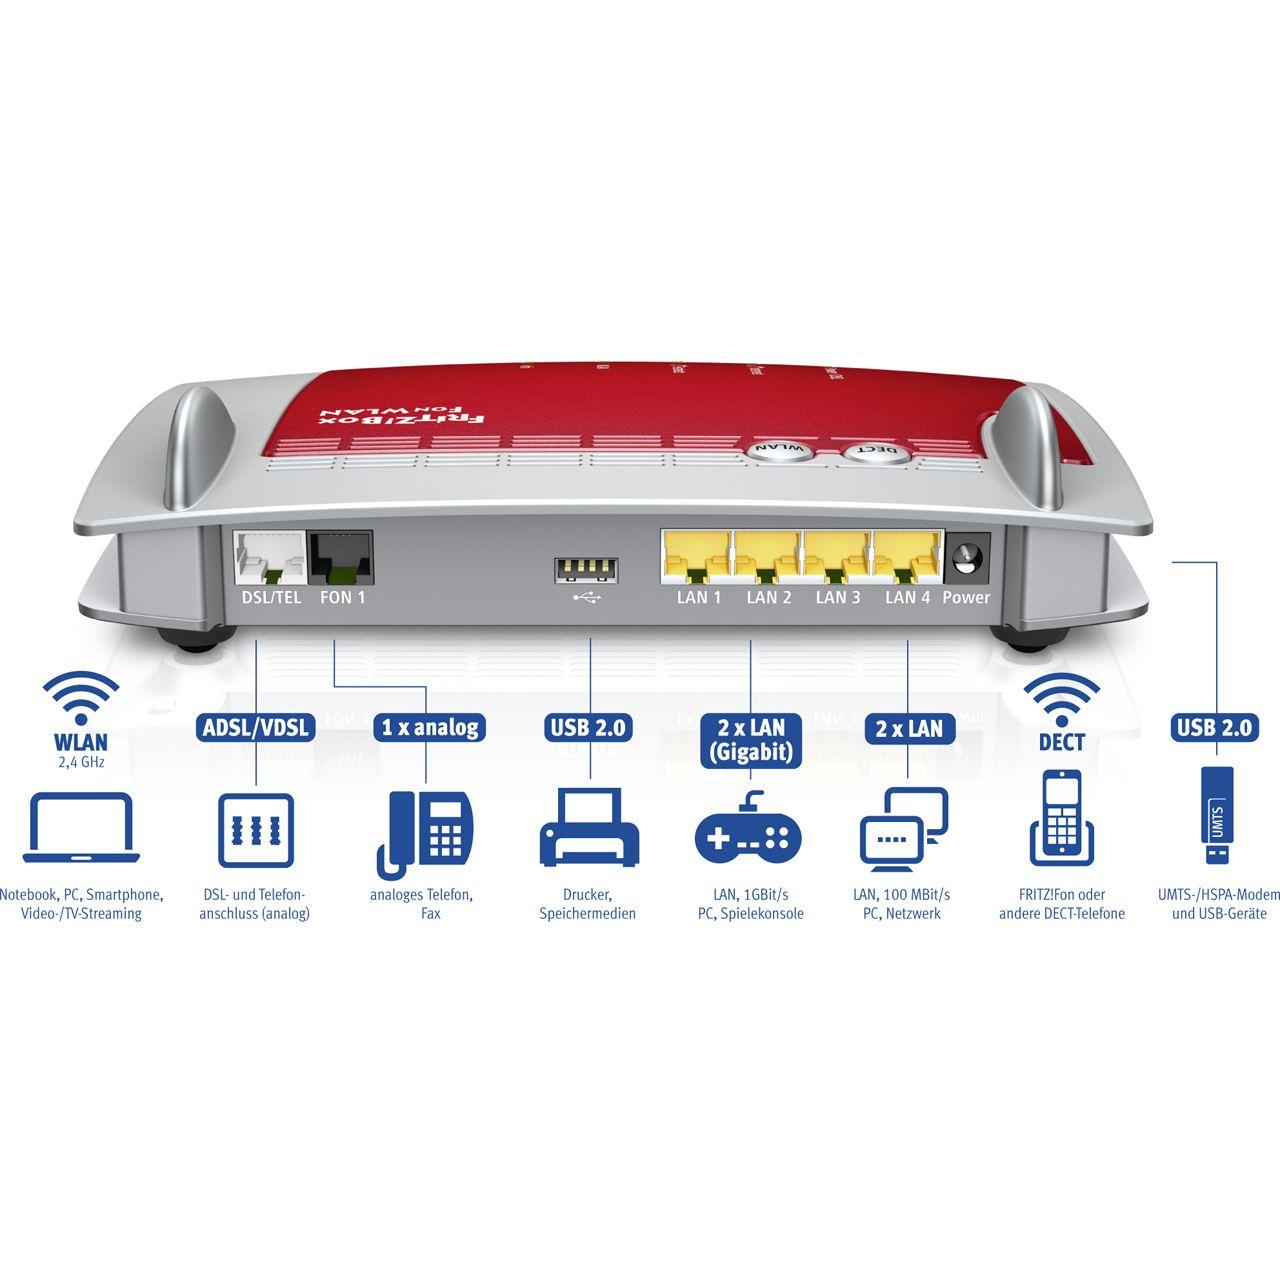 AVM FRITBox 7360 - WLAN Router + Modem | Mindfactory.de - Hardware ...